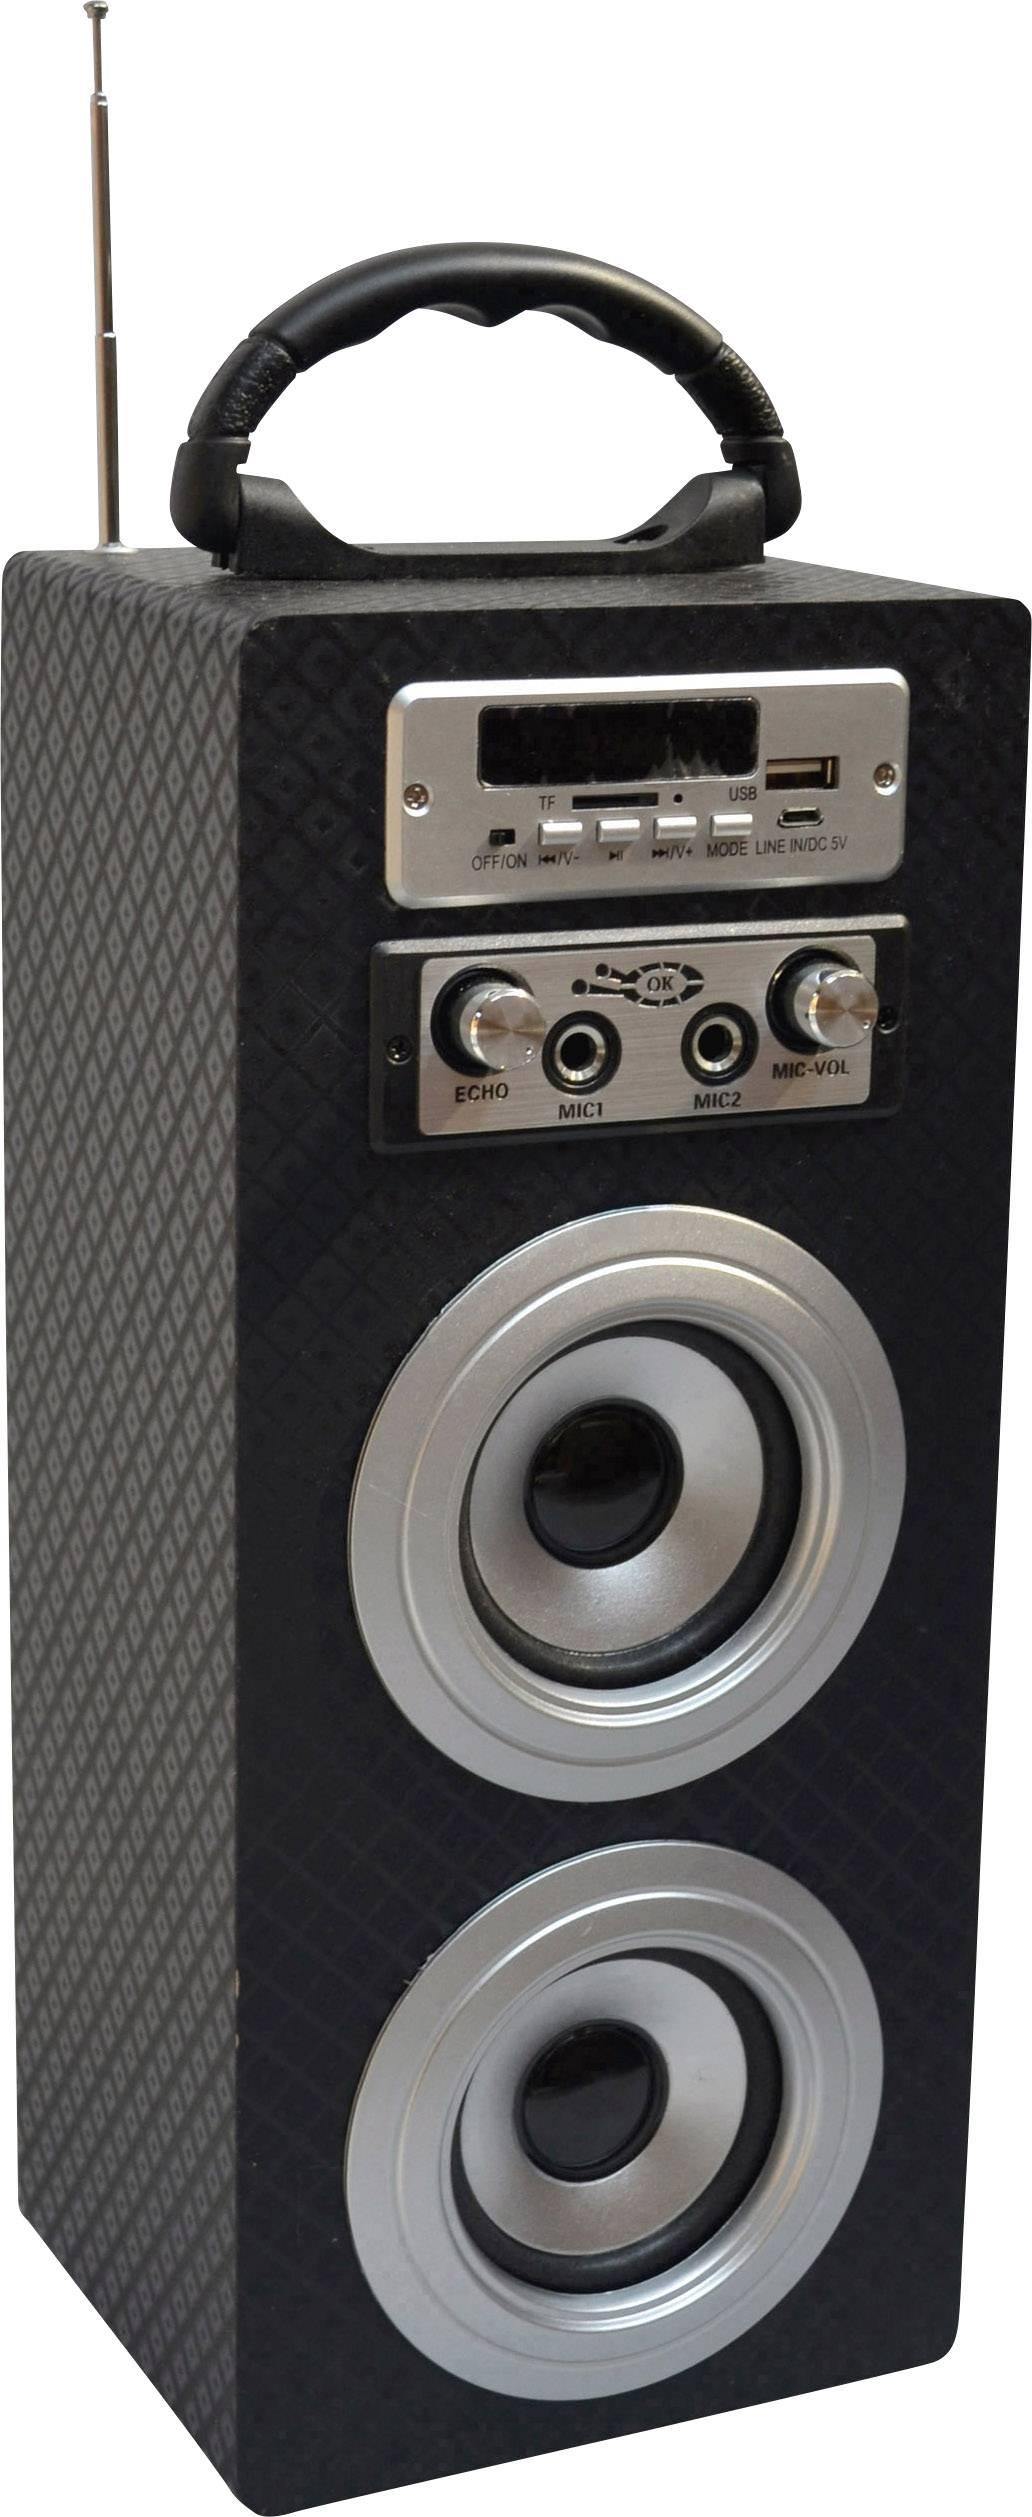 MSA Musikinstrumente KBQ33 Altoparlante Bluetooth AUX, Radio FM, SD, USB Carbone